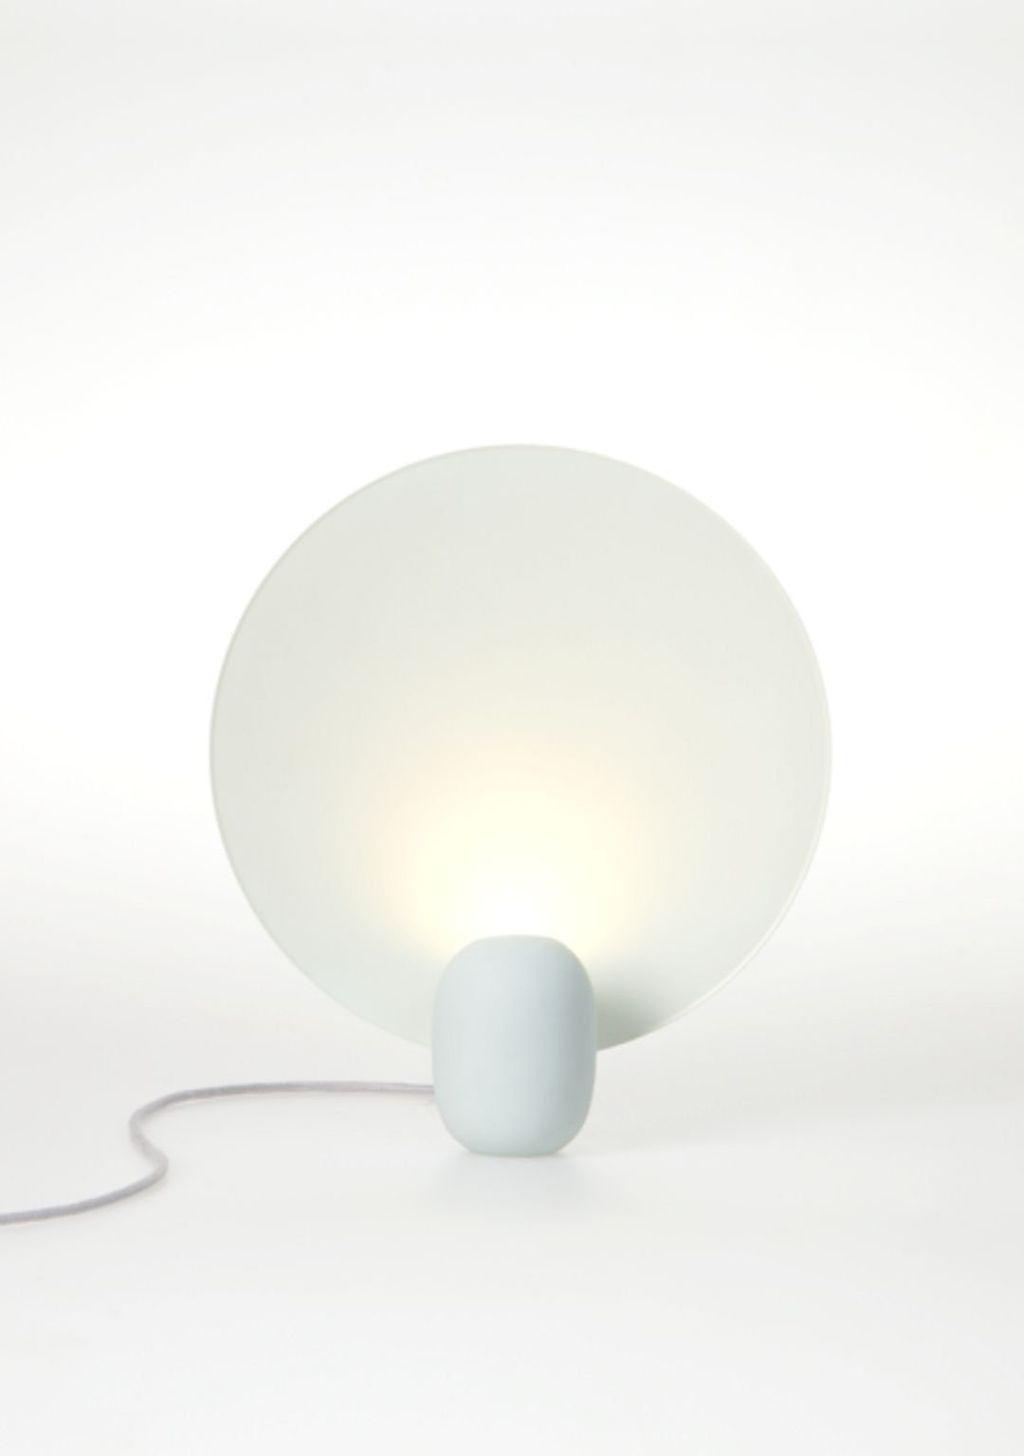 Futuristic Table Lamps Design Ideas For Workspaces 05